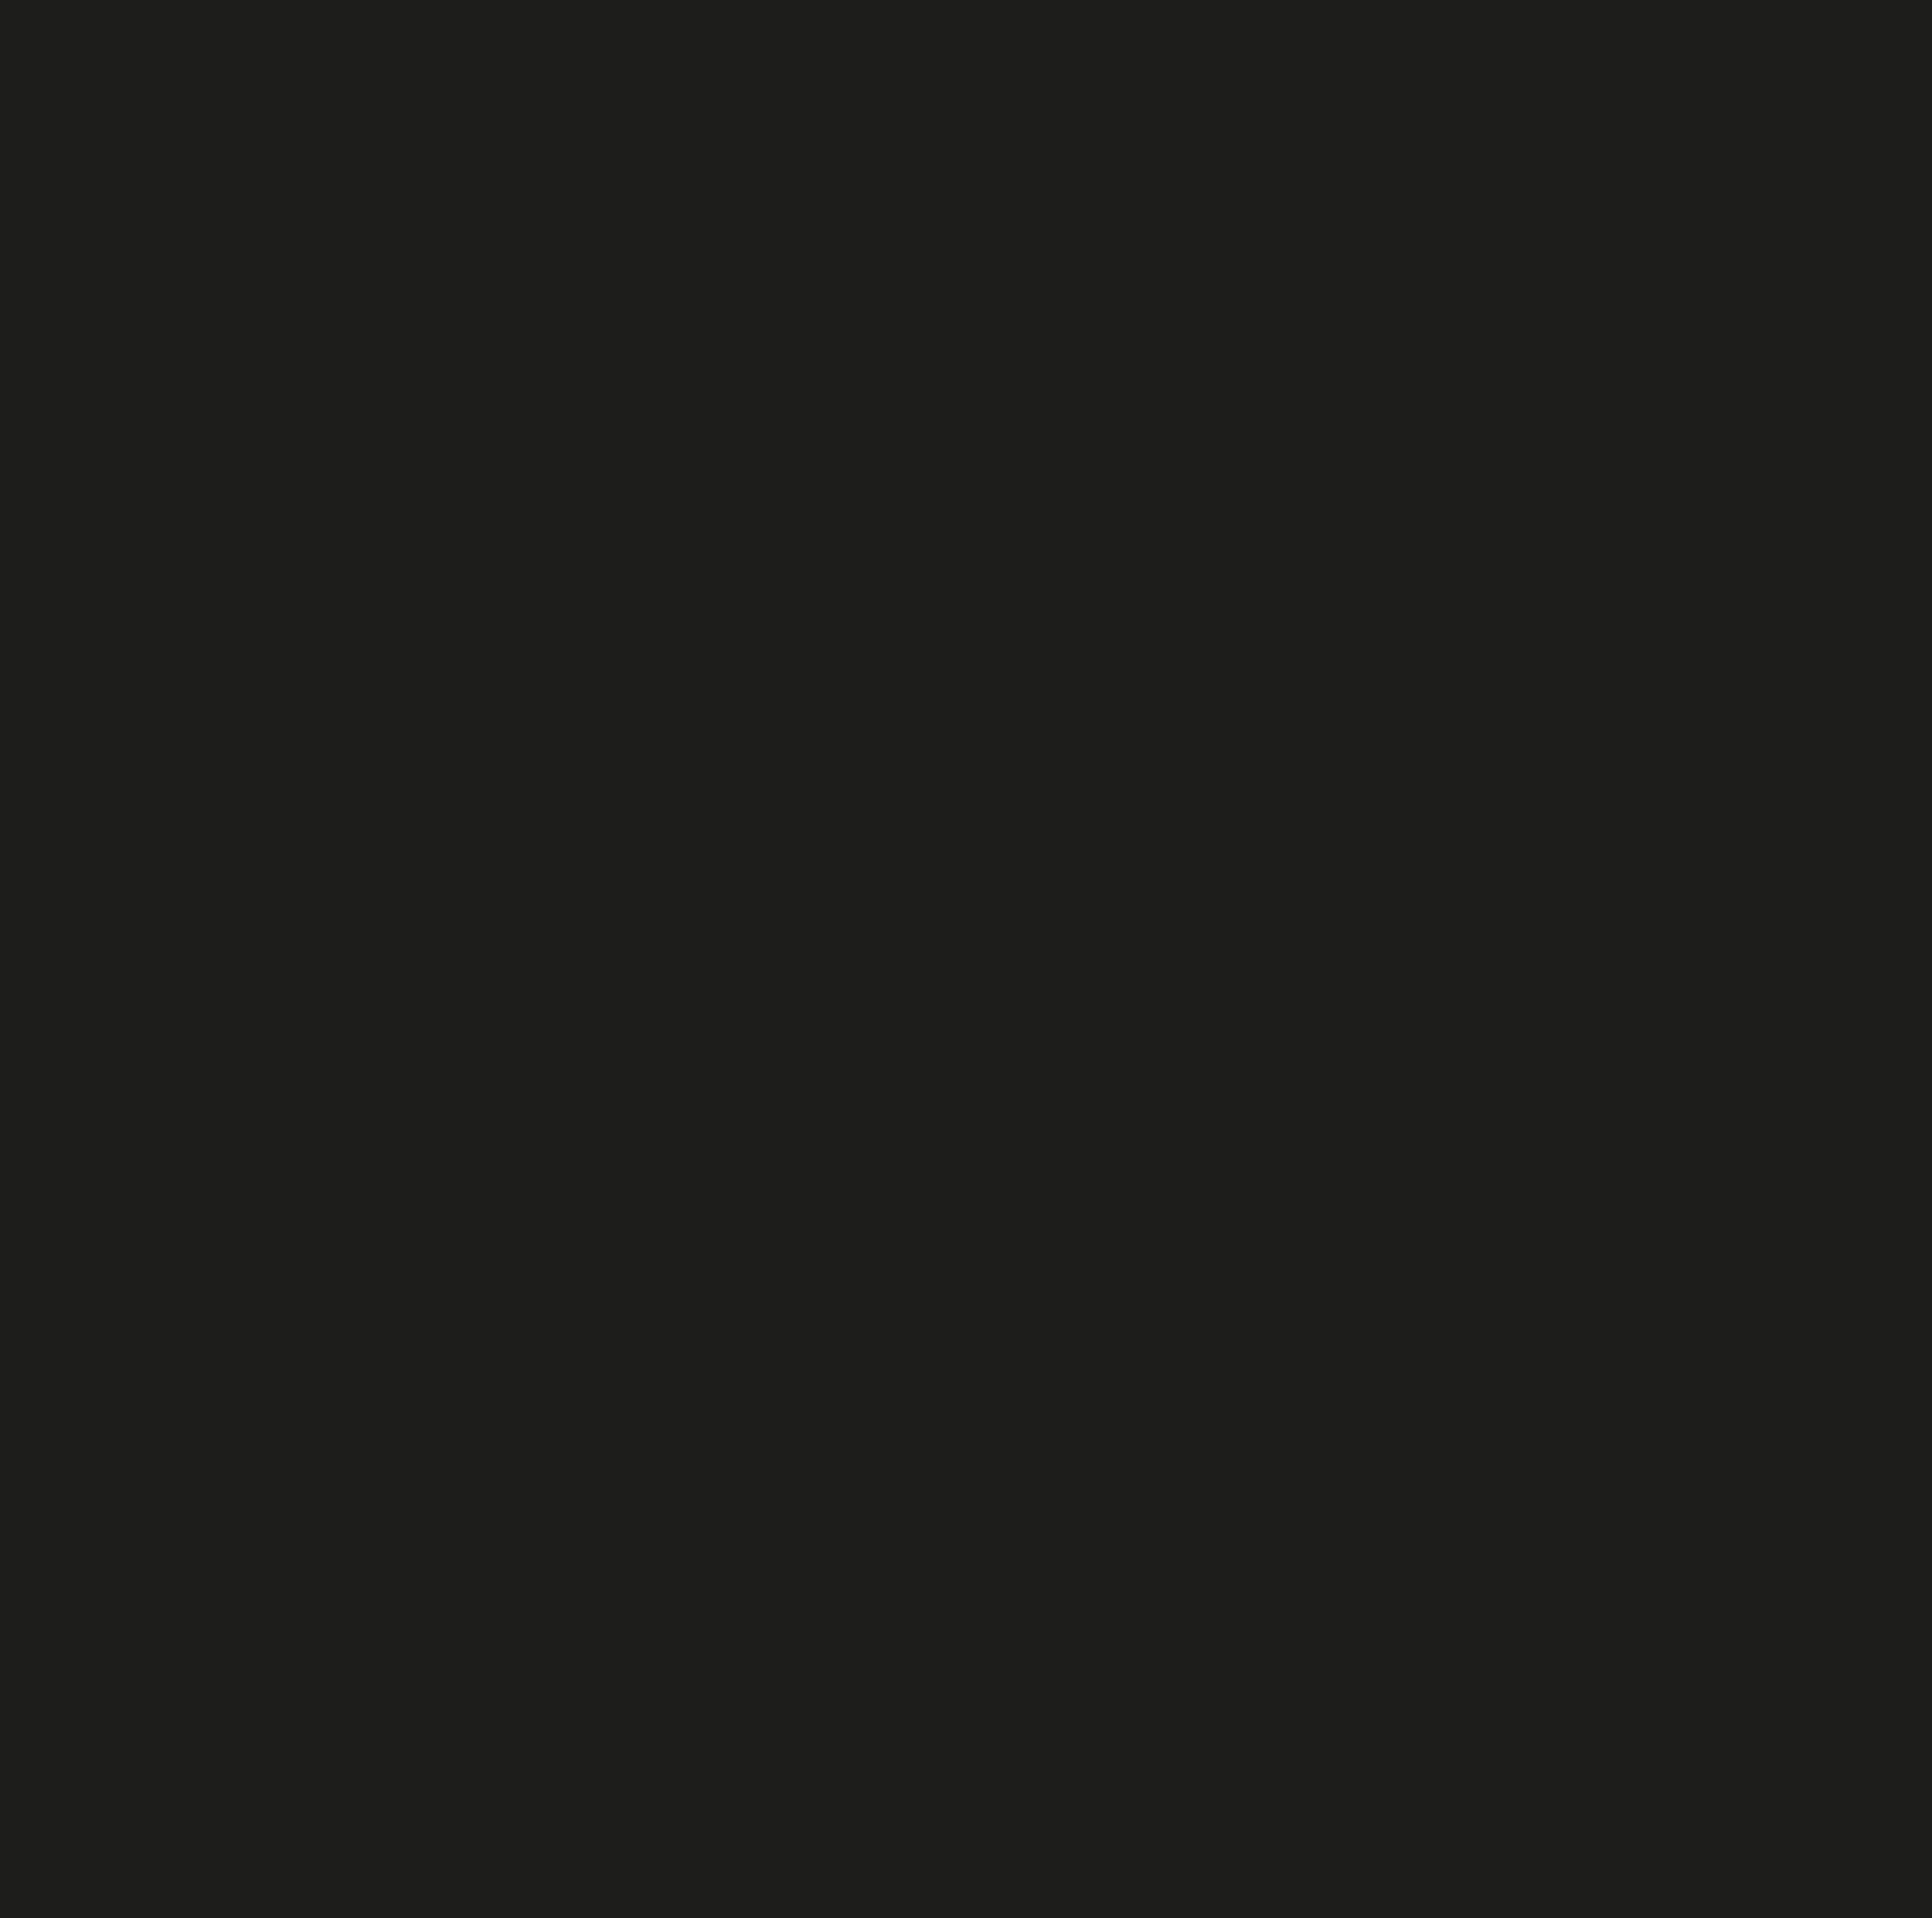 qr_code_twintpng